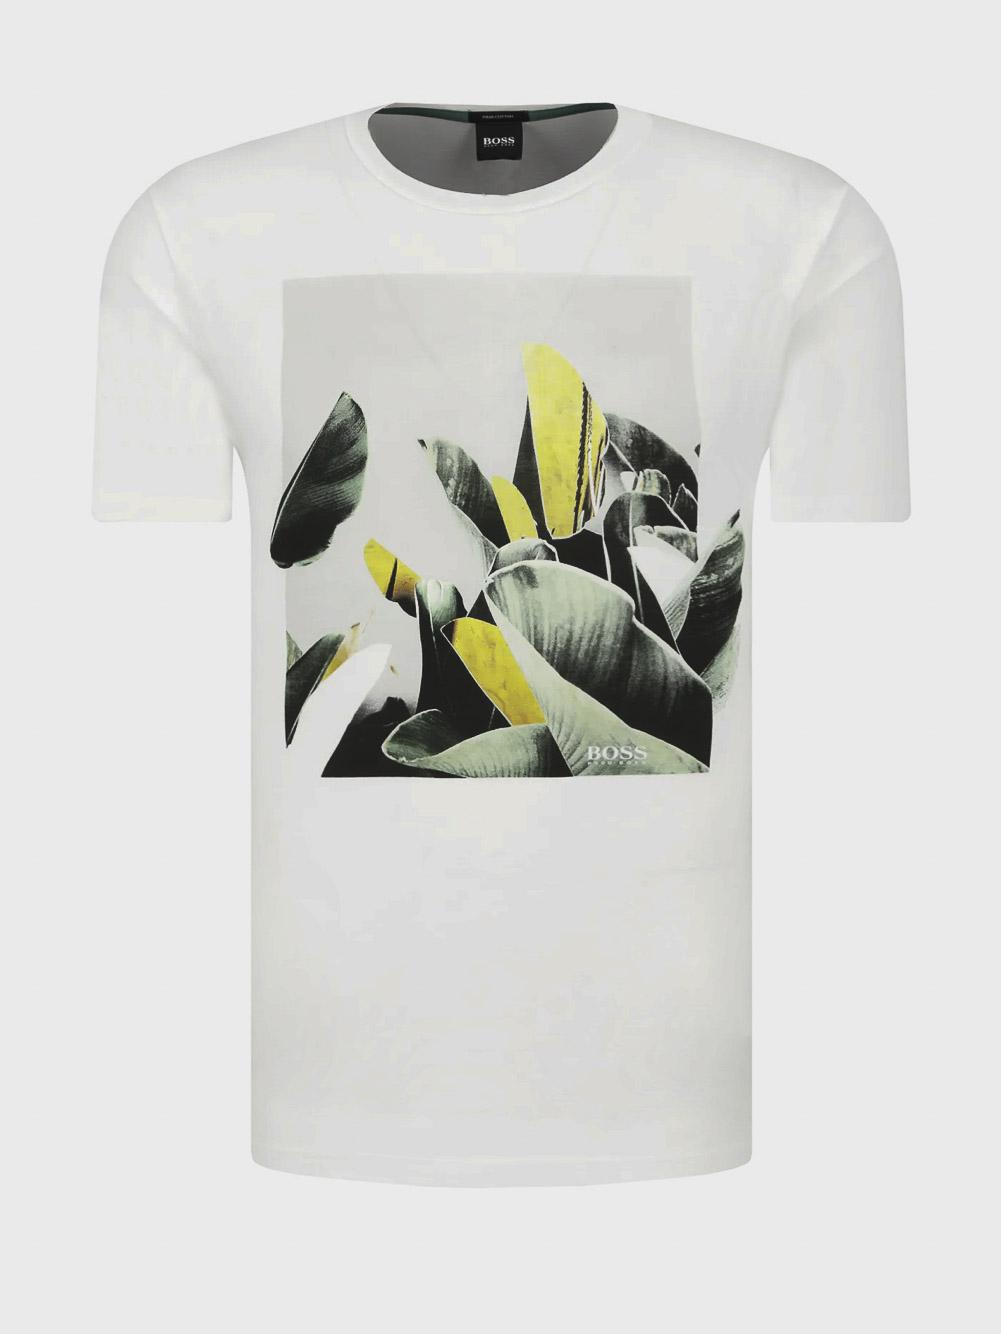 BOSS Μπλούζα T-Shirt 50427922-100 ΛΕΥΚΟ